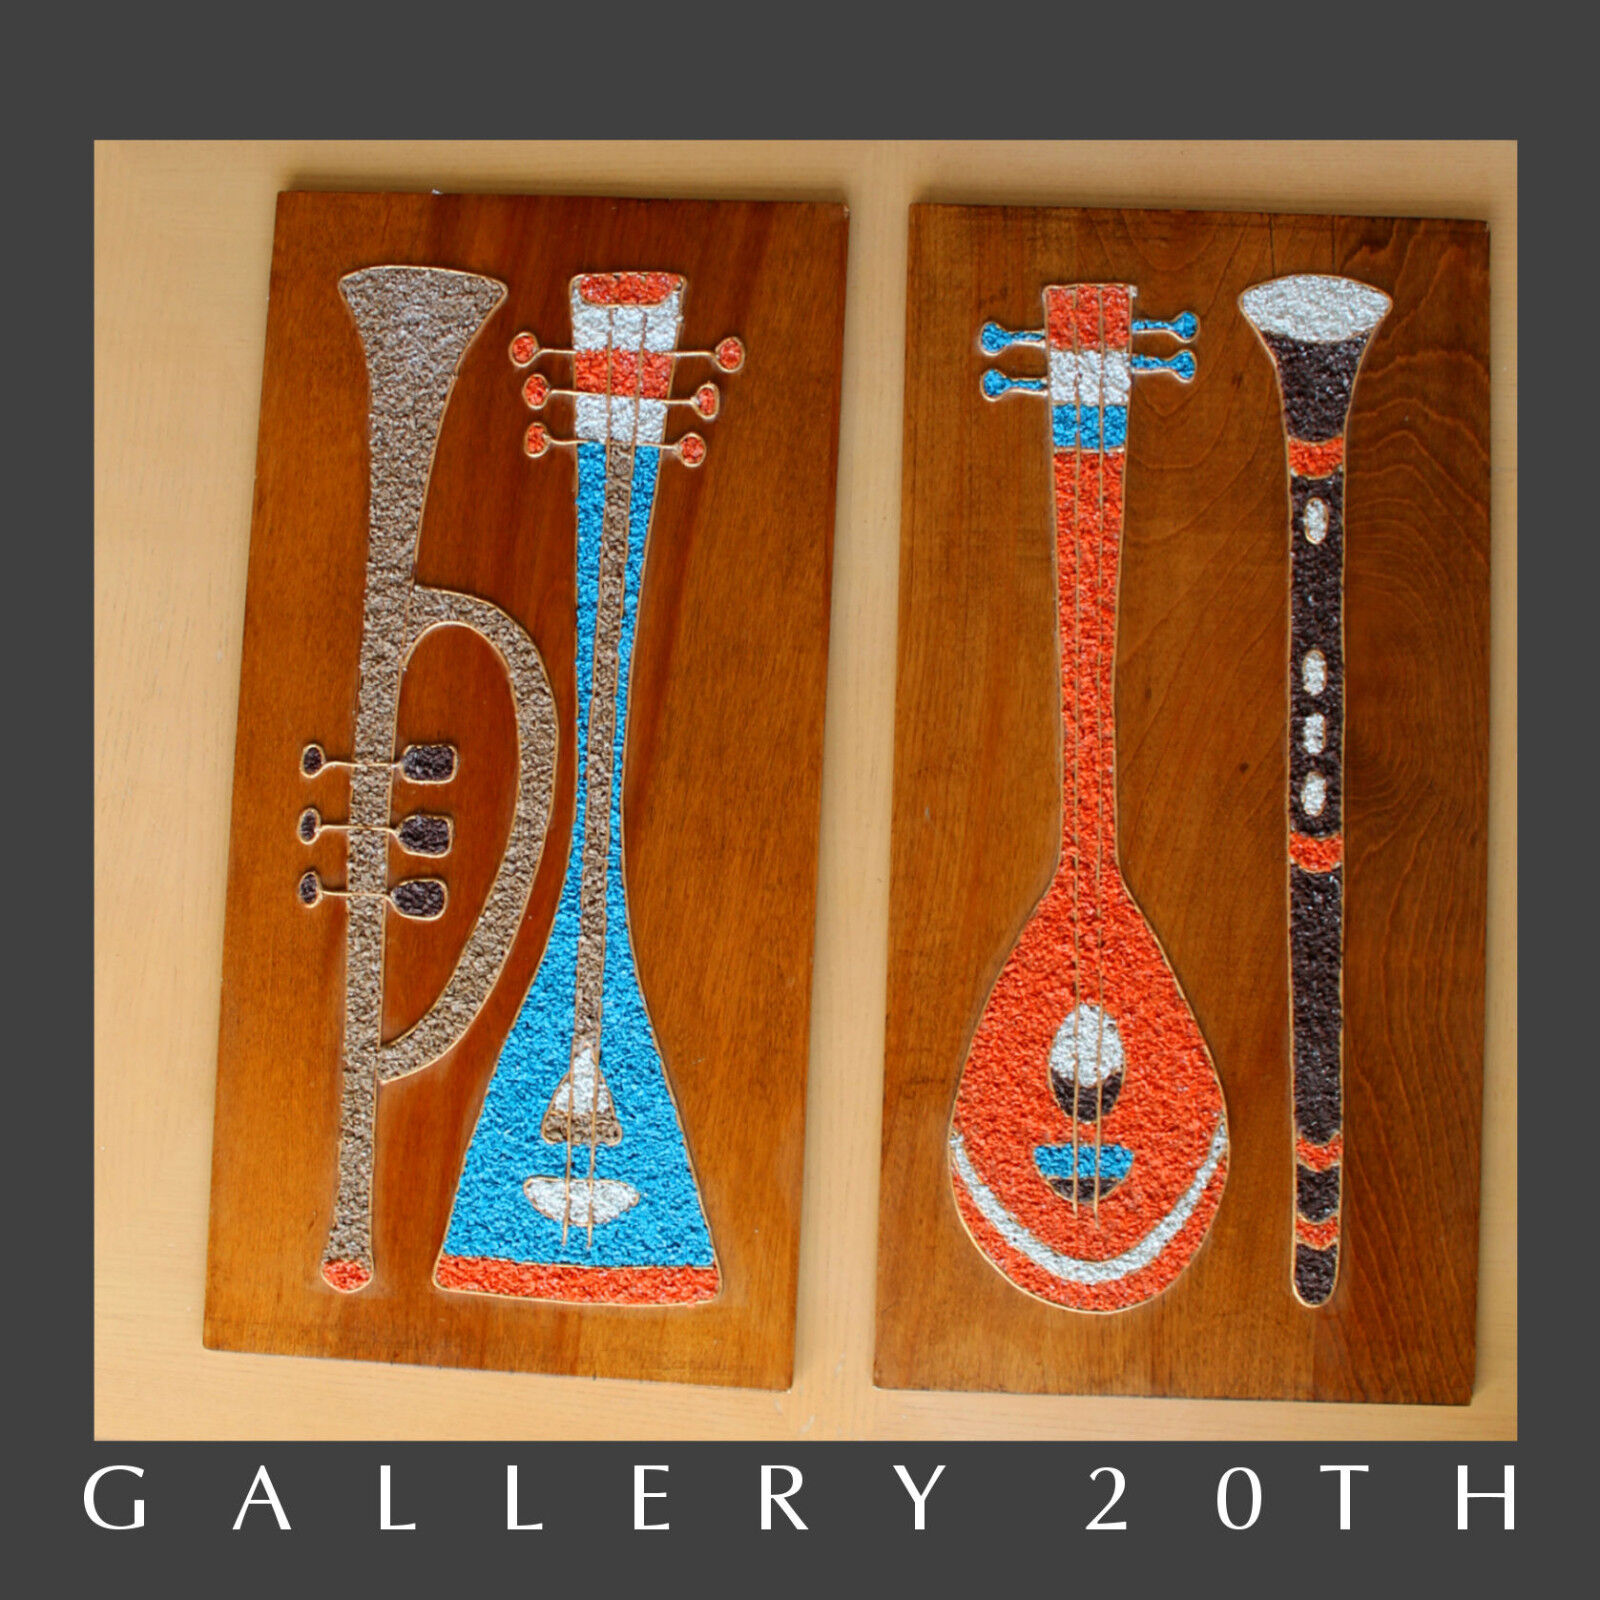 MID CENTURY MODERN ATOMIC MUSIC INSTRUMENT WALL ART VTG GRAVEL 50S MOSAIC PEBBLE - $900.00